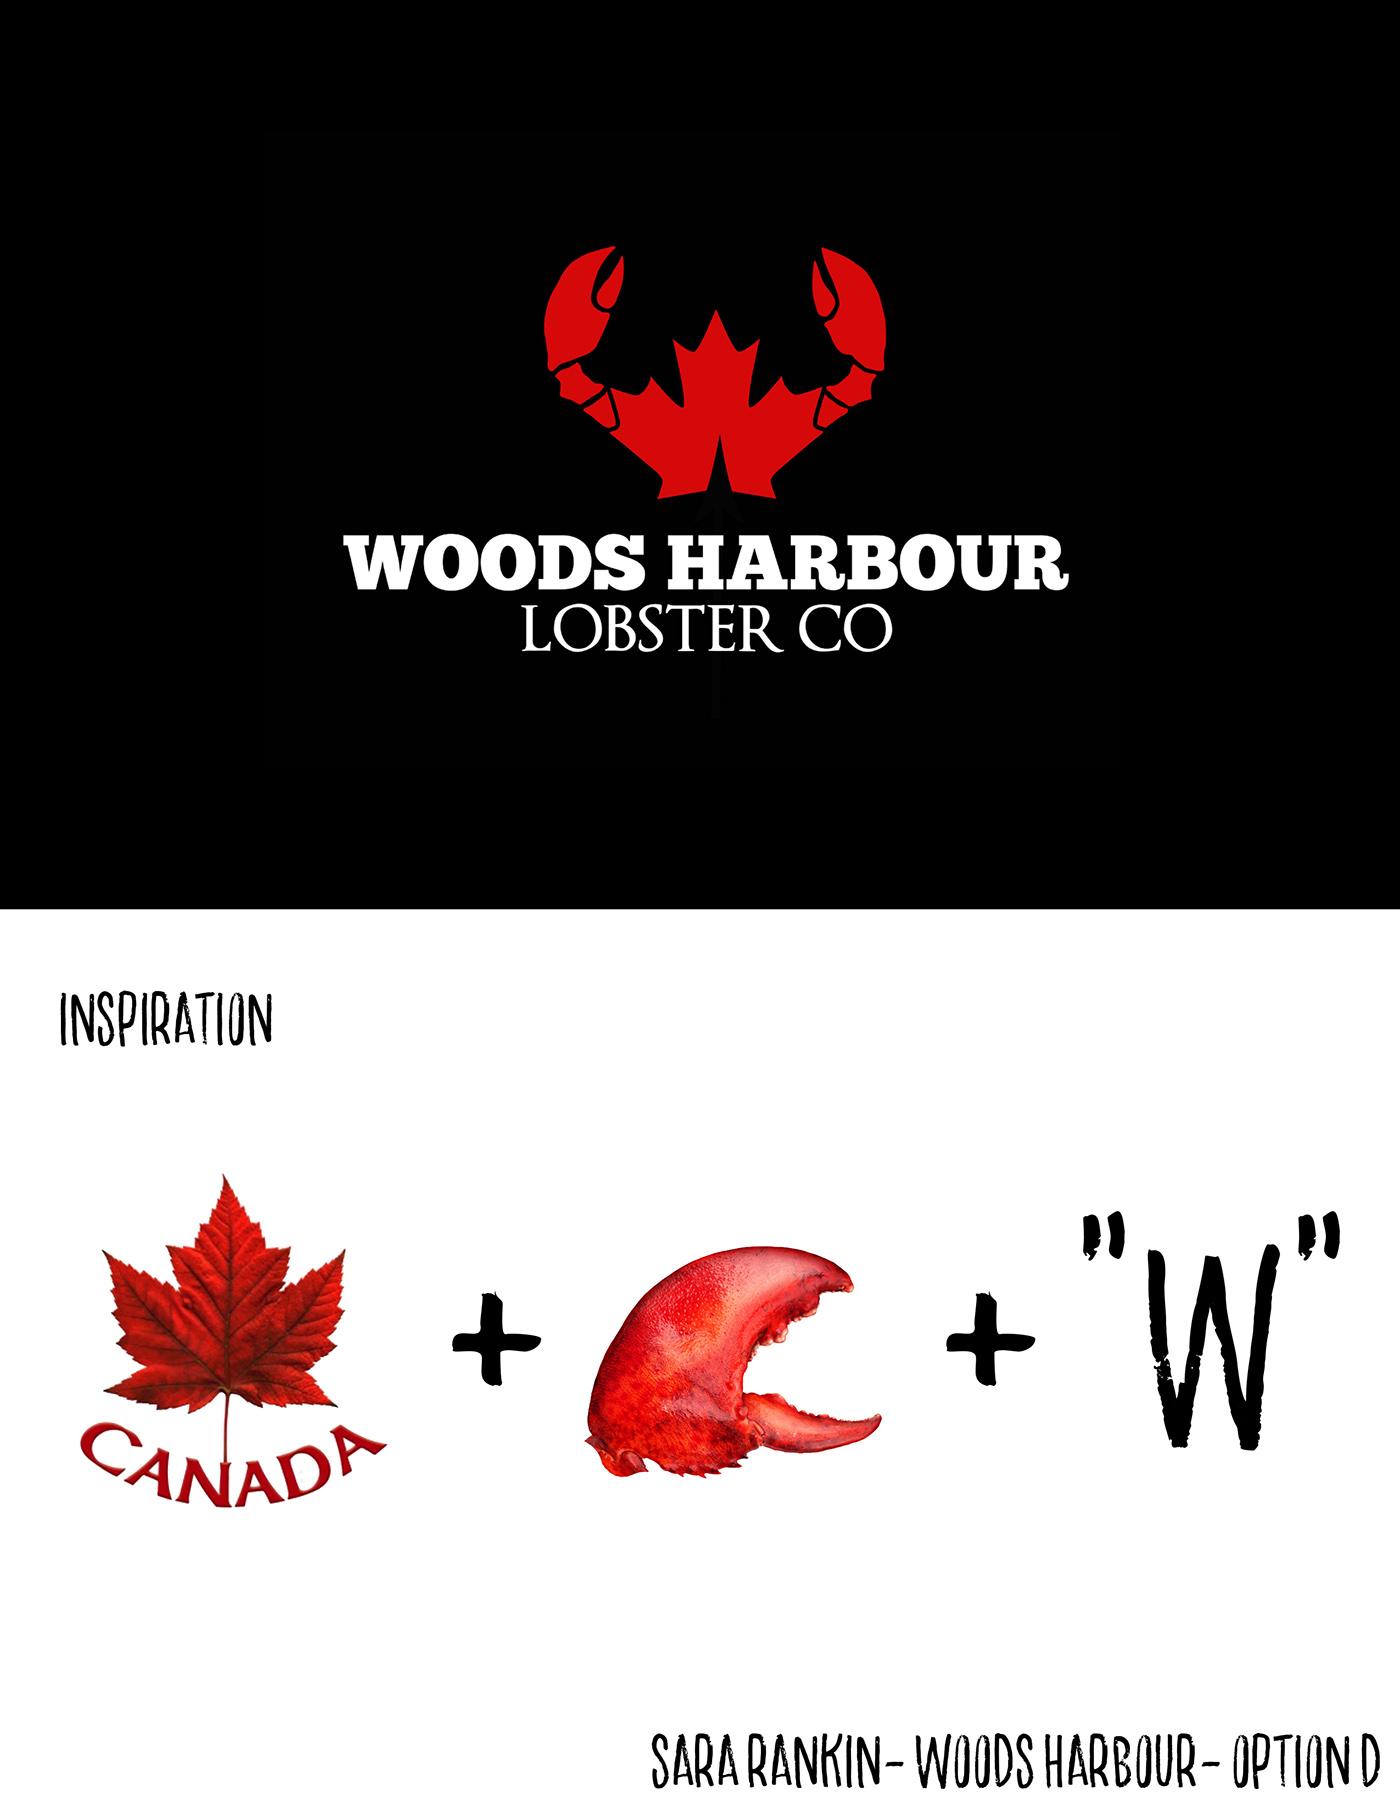 lobster logo nova scotia seafood claws Canada Canadian